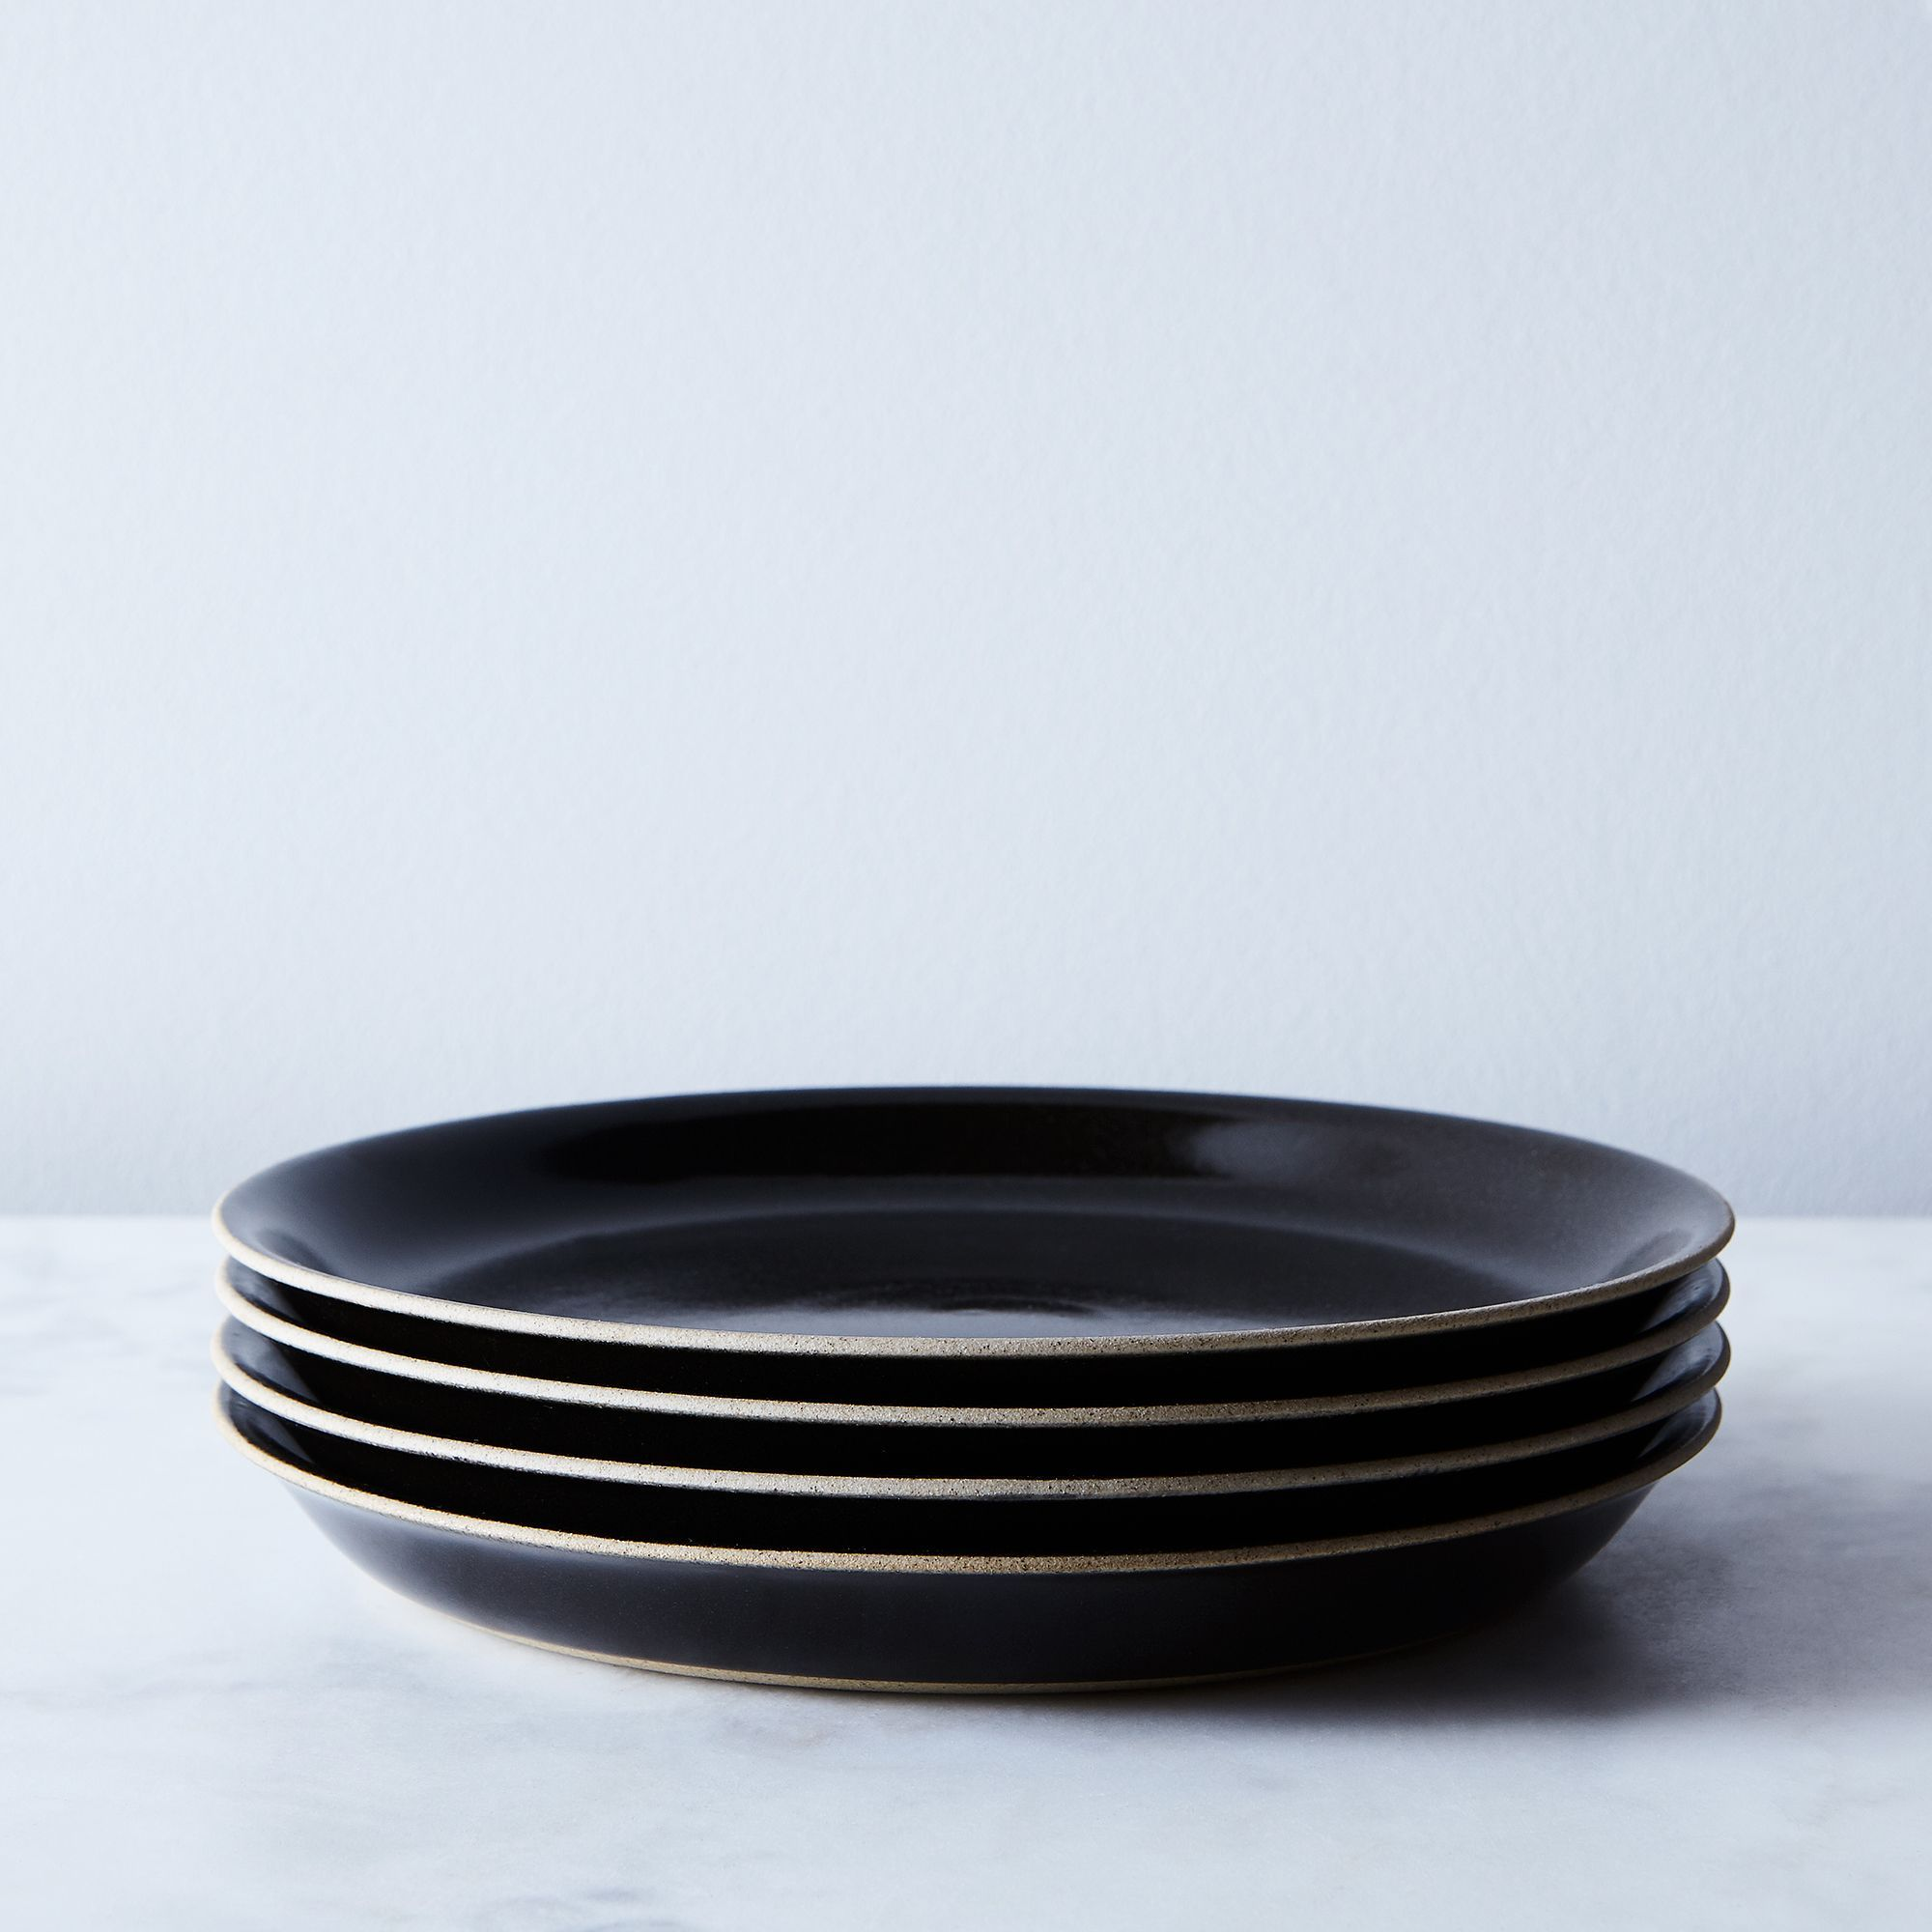 Black Japanese Ceramic Dinnerware (Set of 4) & Black Japanese Ceramic Dinnerware (Set of 4) | kitchen | Pinterest ...